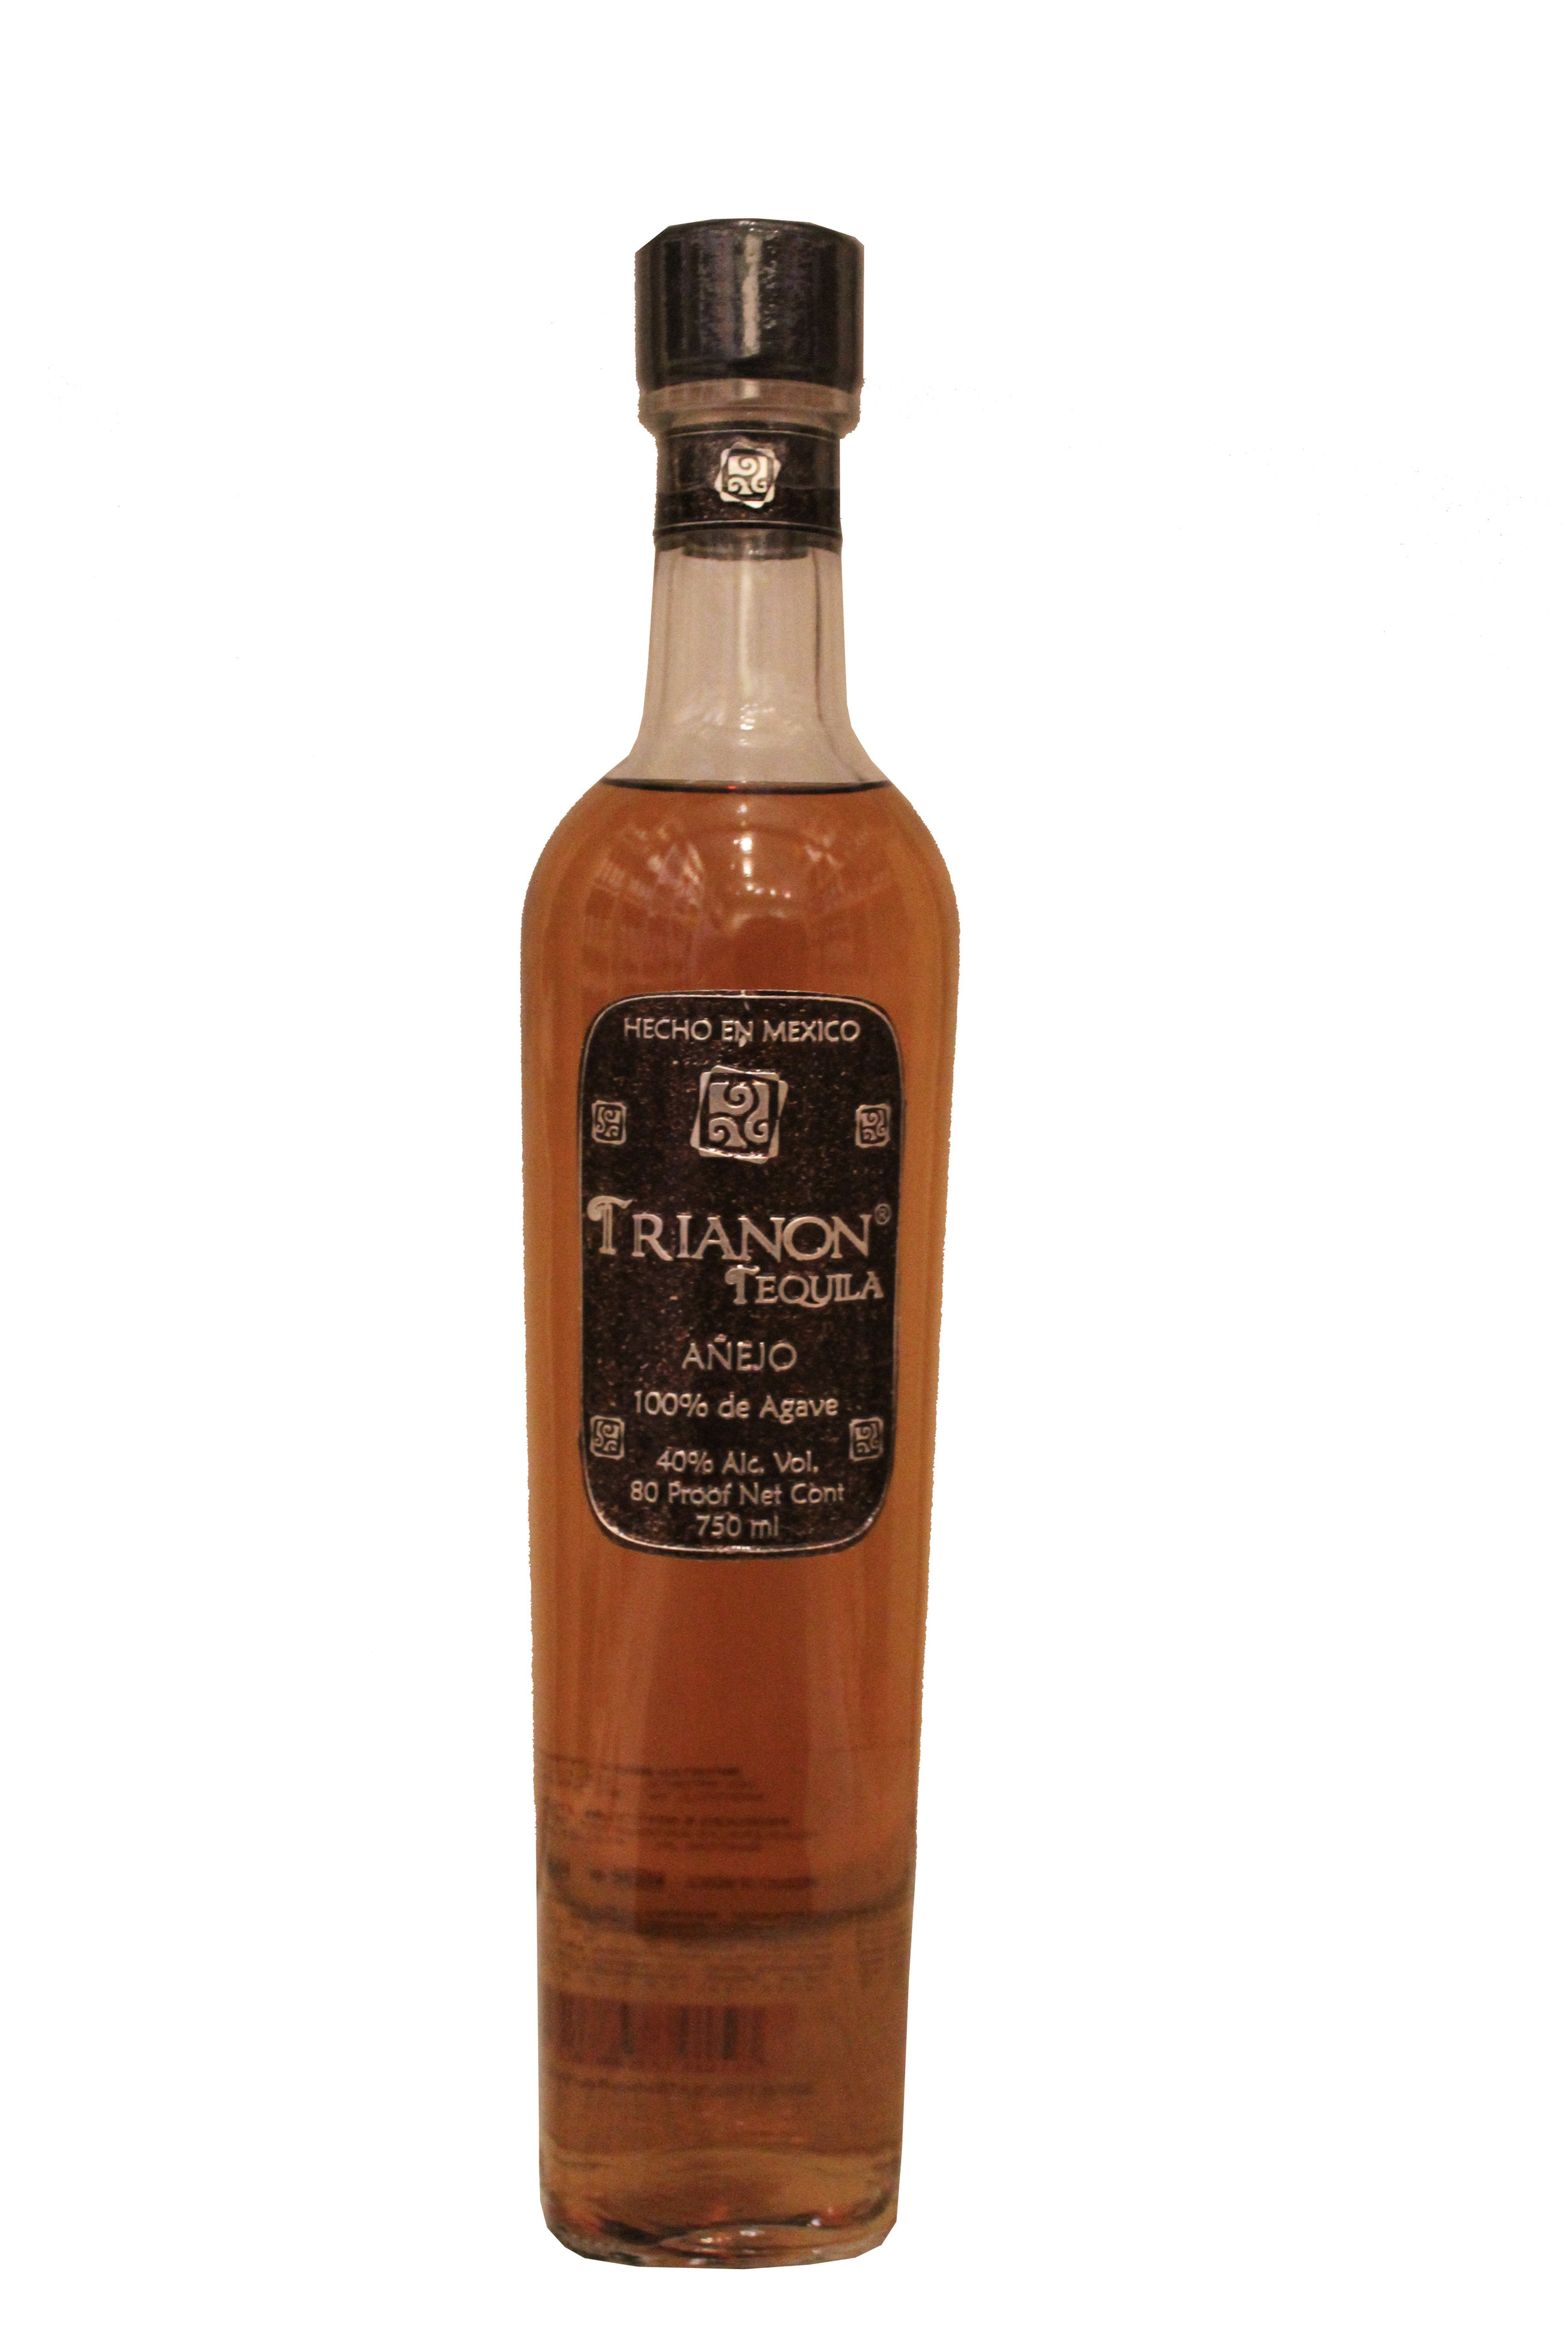 Anejo Tequila  Trianon Tequila, Mexico